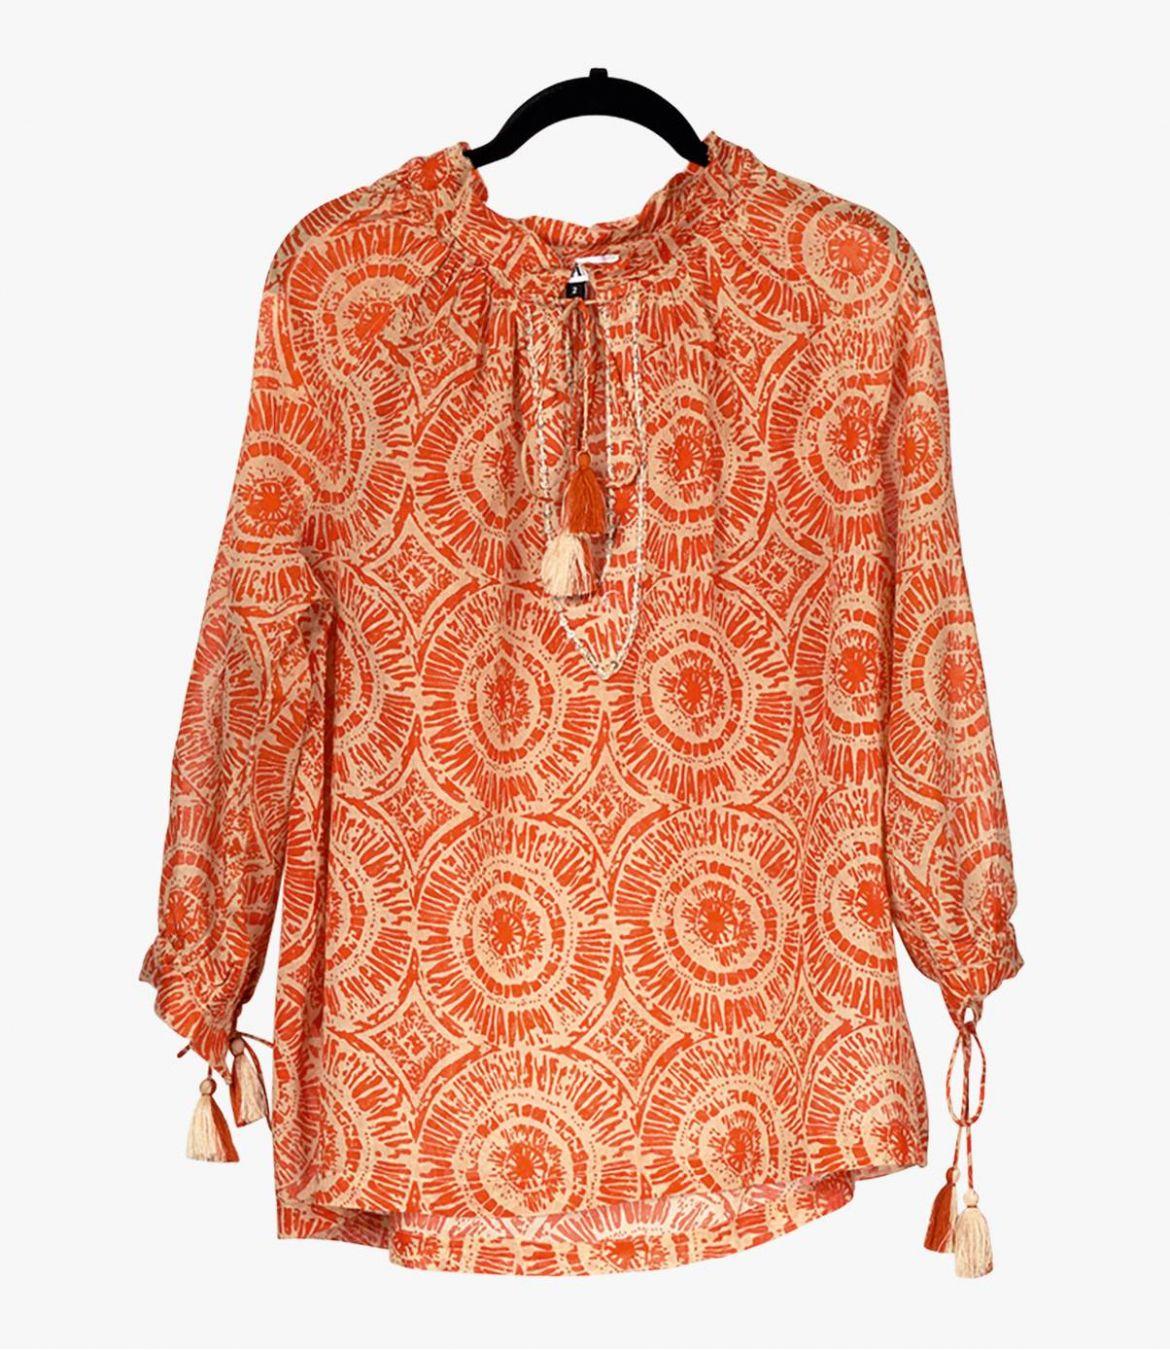 BETI SUN Cotton Blouse for Women Storiatipic - 2